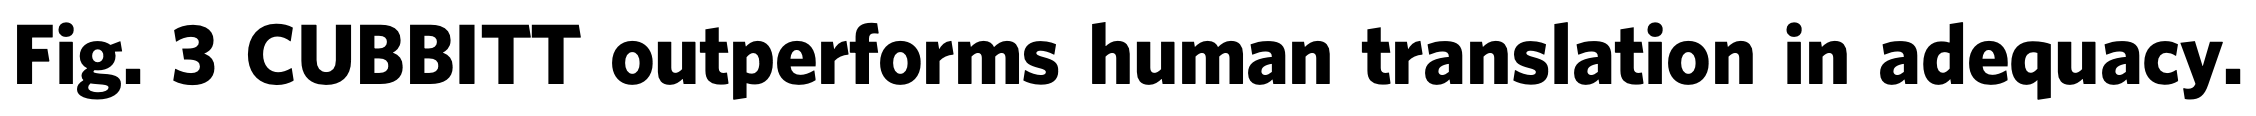 Machine Translation Outperforms Human Translation Claim